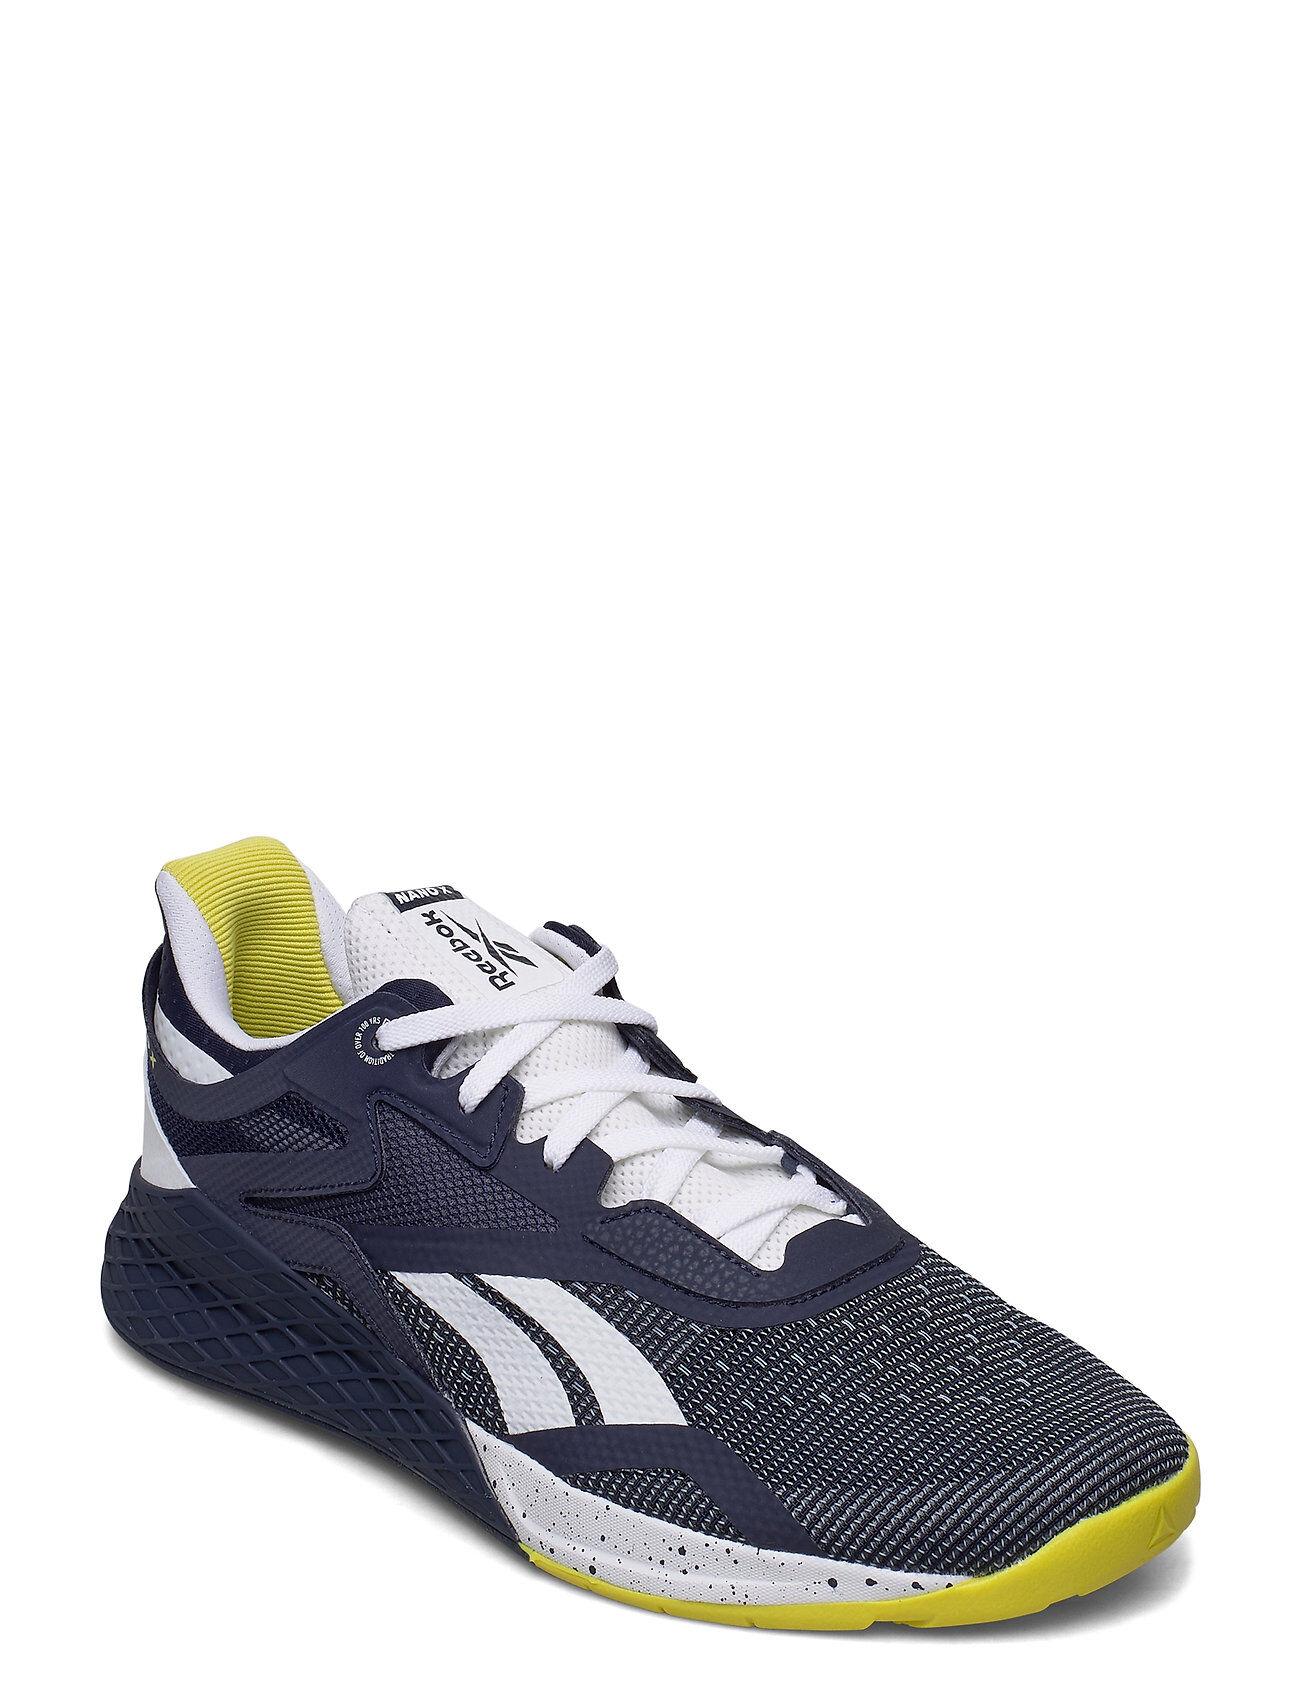 Reebok Performance Reebok Nano X Shoes Sport Shoes Training Shoes- Golf/tennis/fitness Sininen Reebok Performance